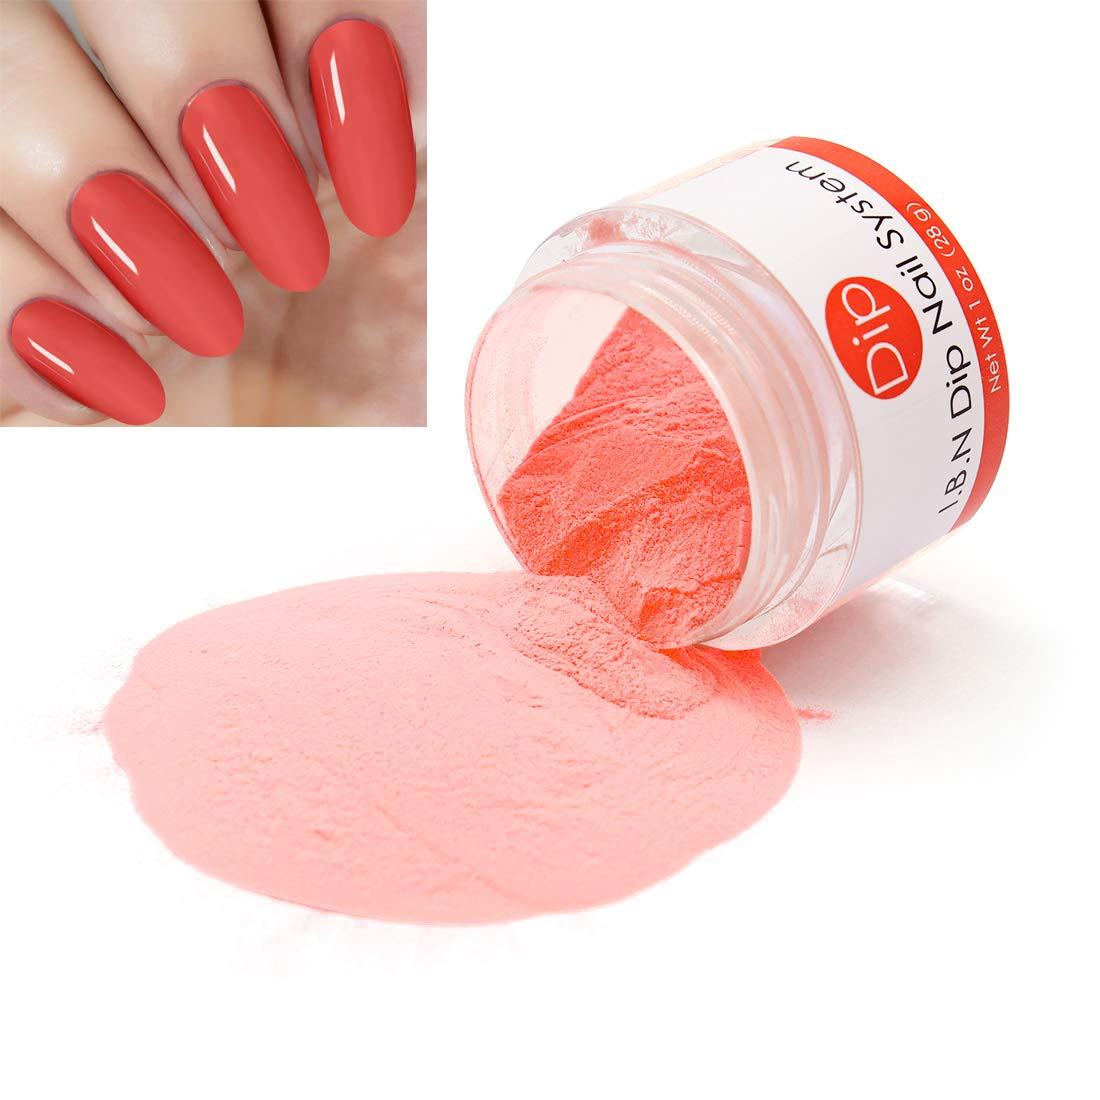 Orange Red Dipping Powder (Added Vitamins) 1 Ounce, I.B.N Dipped Acrylic Dip Powder DIY Manicure Salon Home Use (DIP 027)